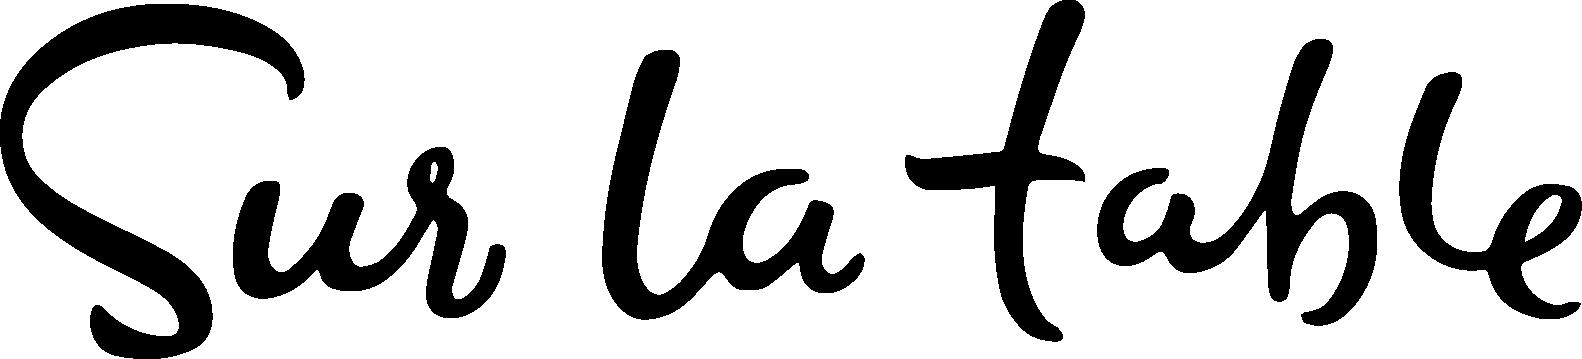 Surlatable_logo-01.png